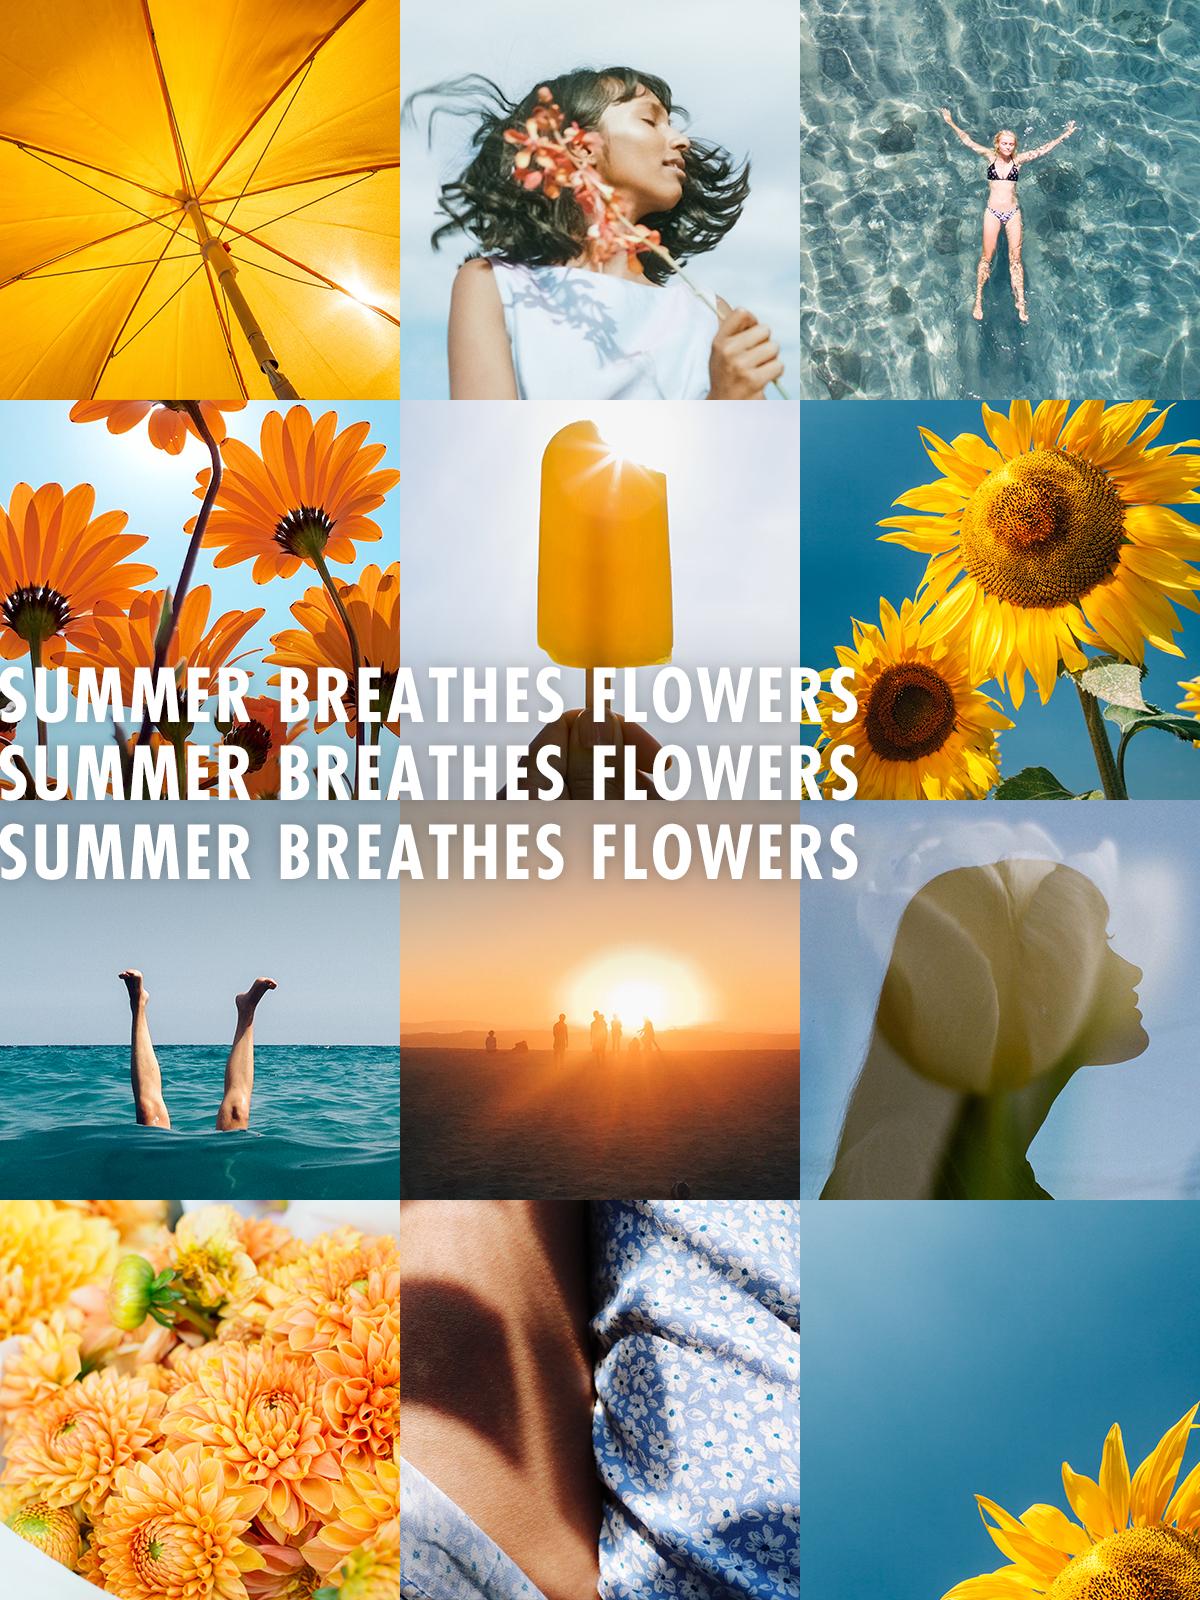 Summer Breathes Flowers on Funnyhowflowersdothat.co.uk